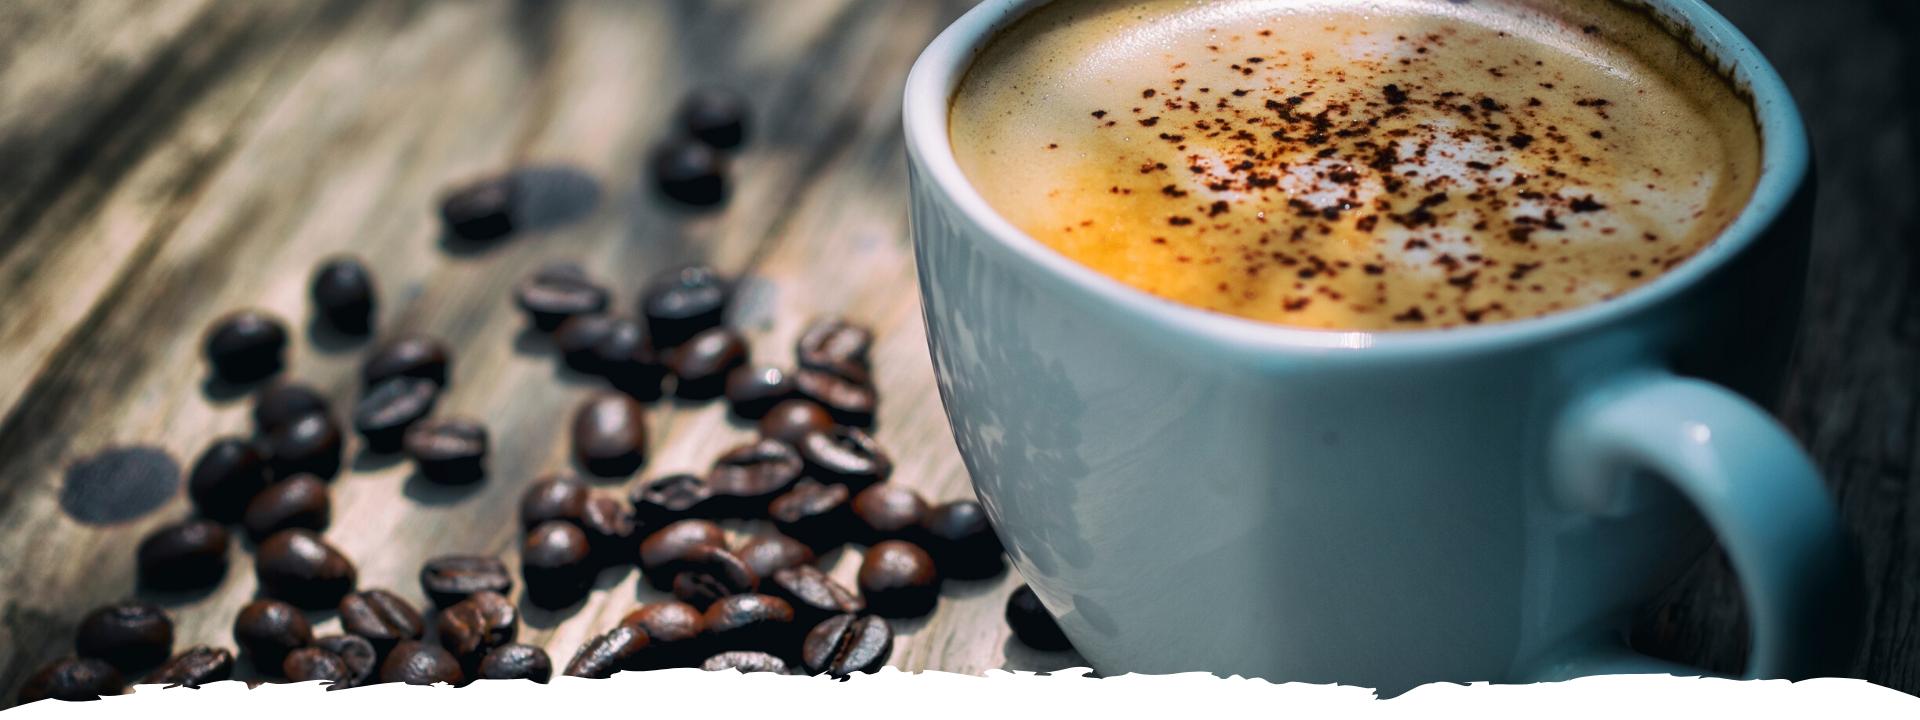 kaffeeleasing-com-trier4